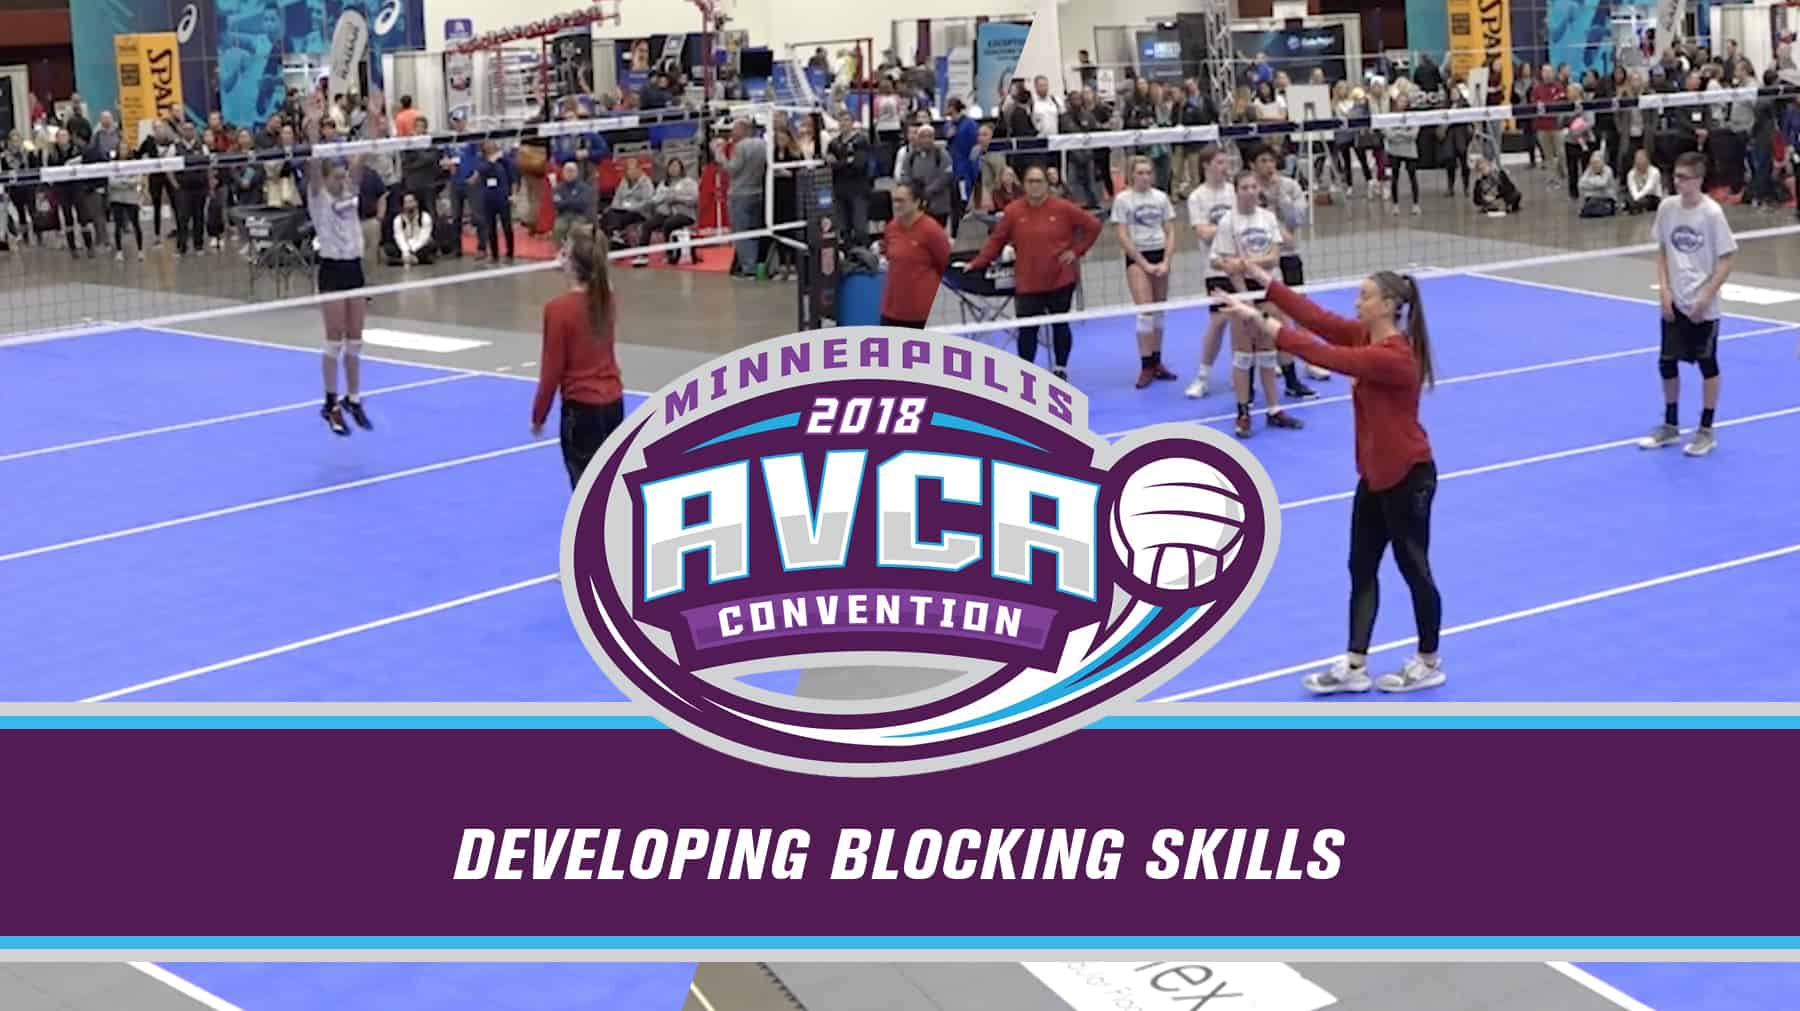 Indoor Developing Blocking Skills